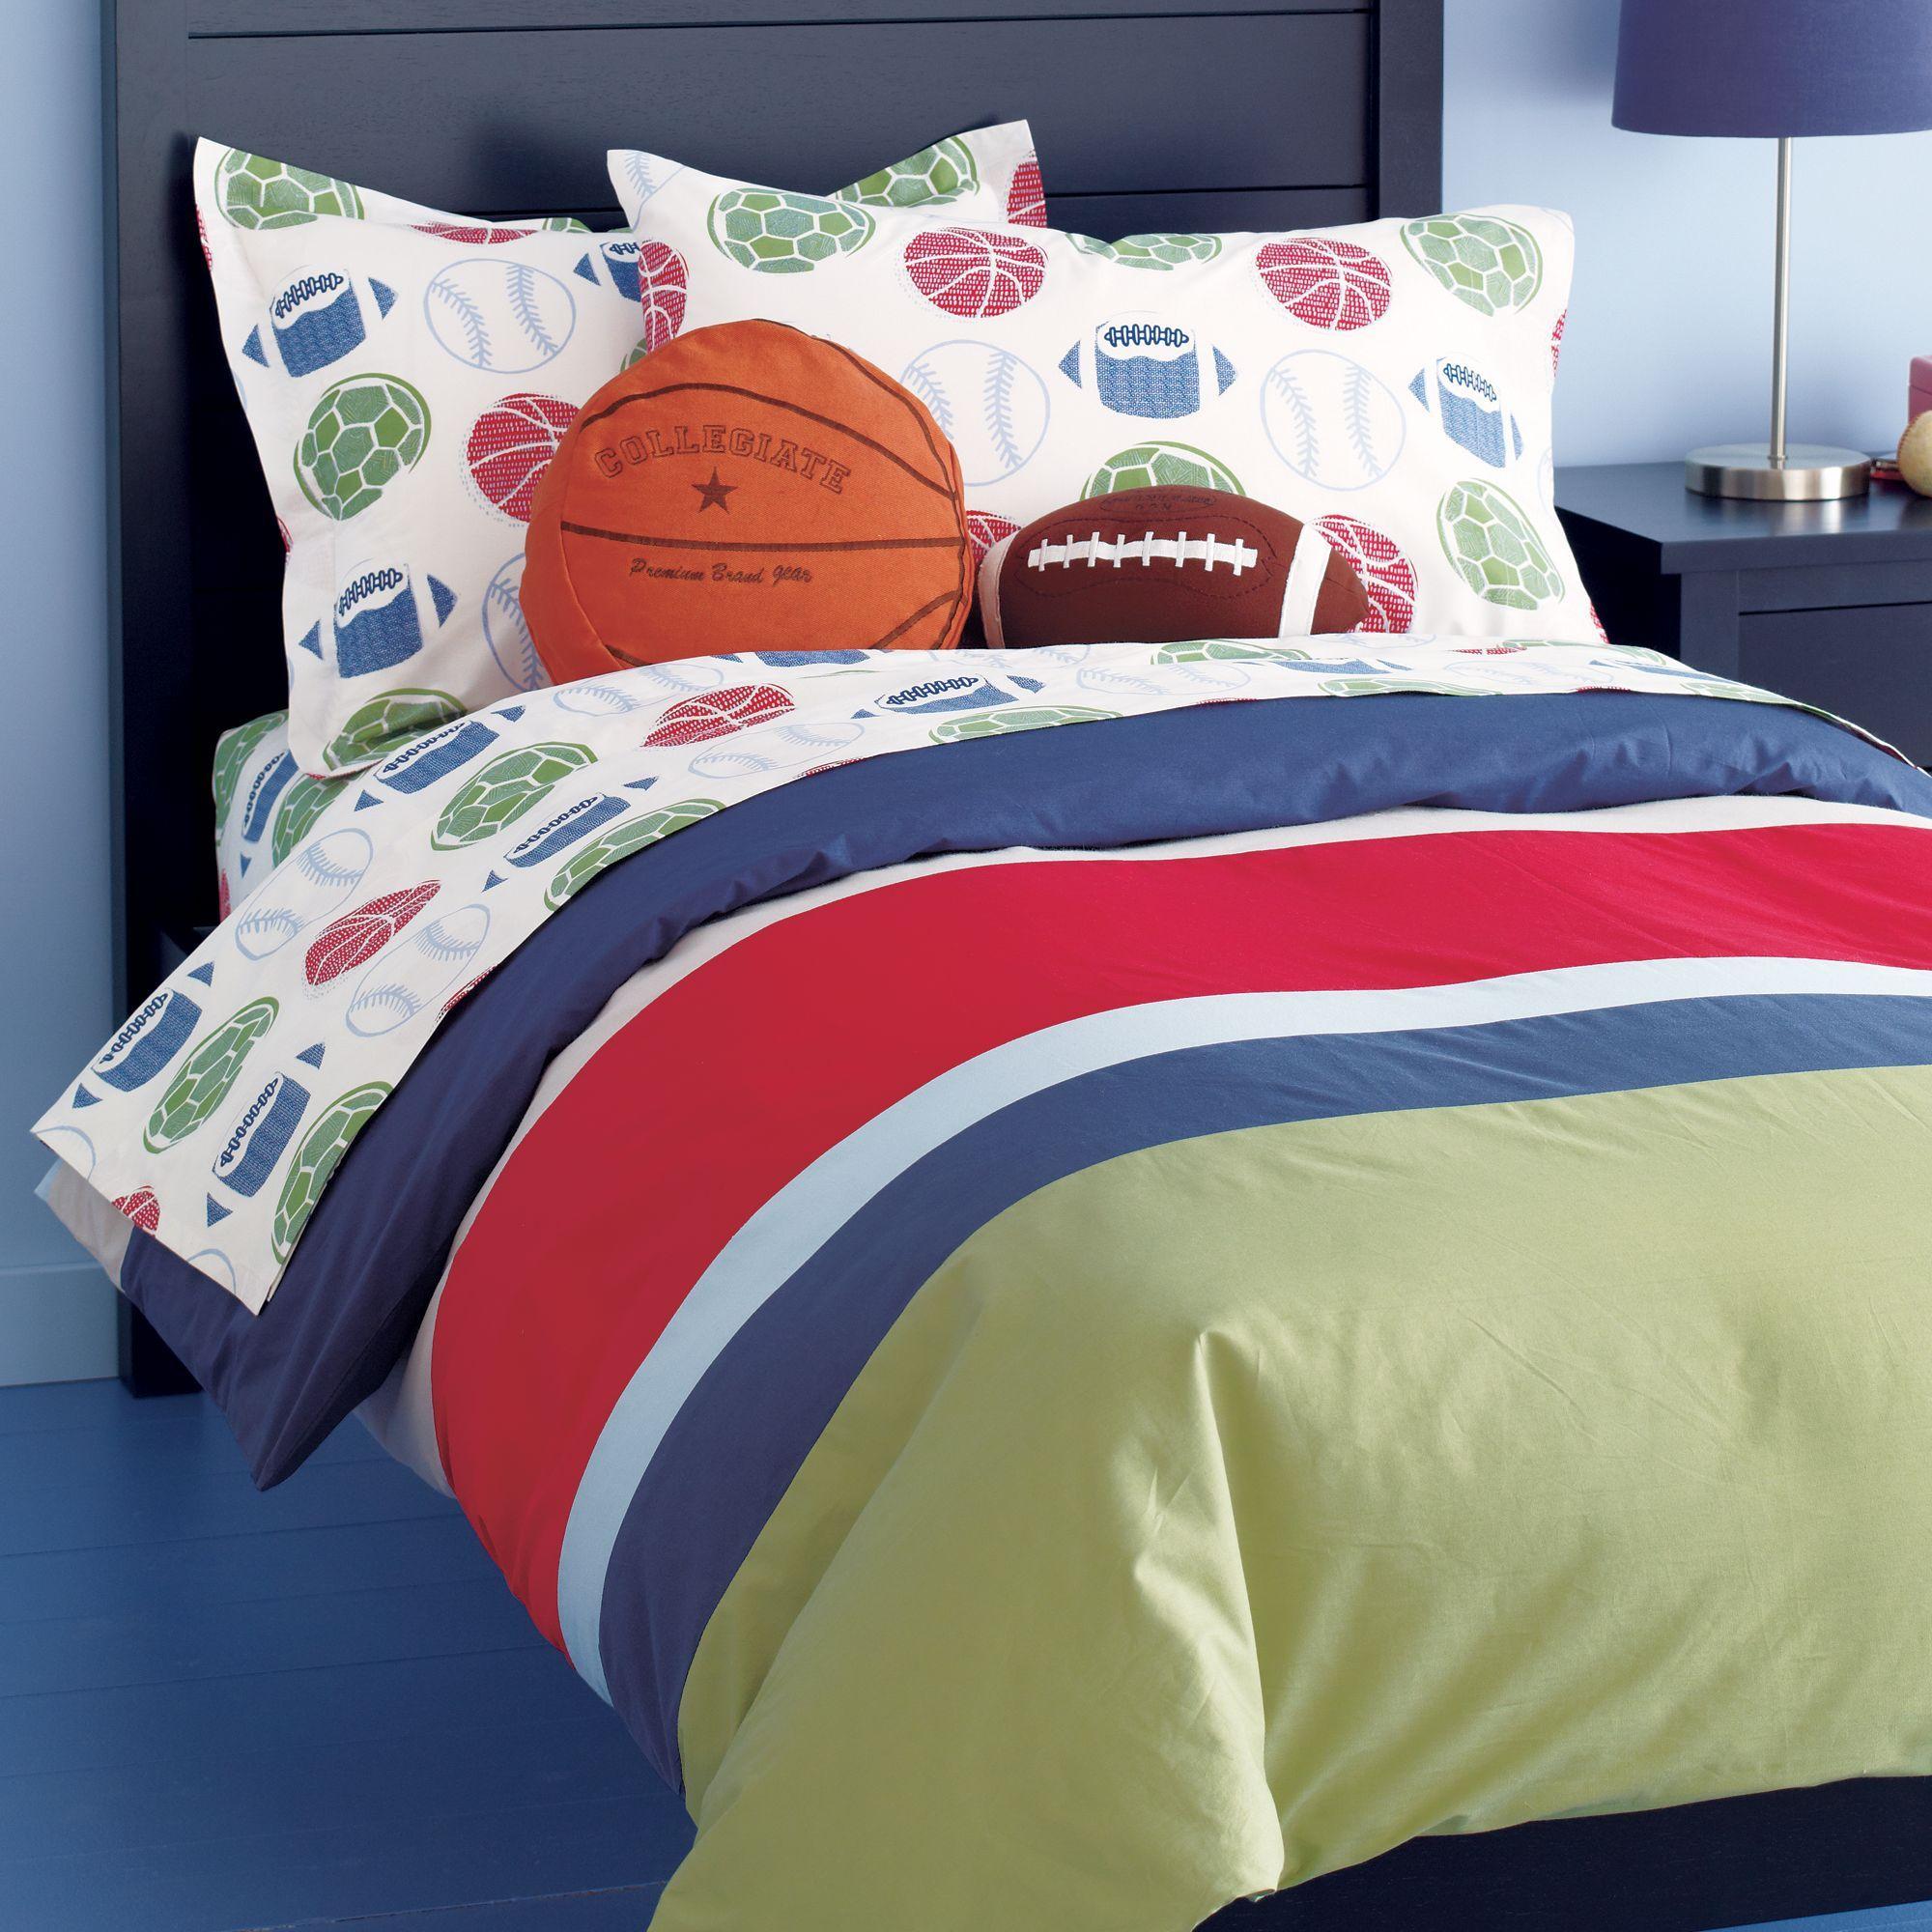 Sports Bedding Set Basketball Football Baseballs and Soccer